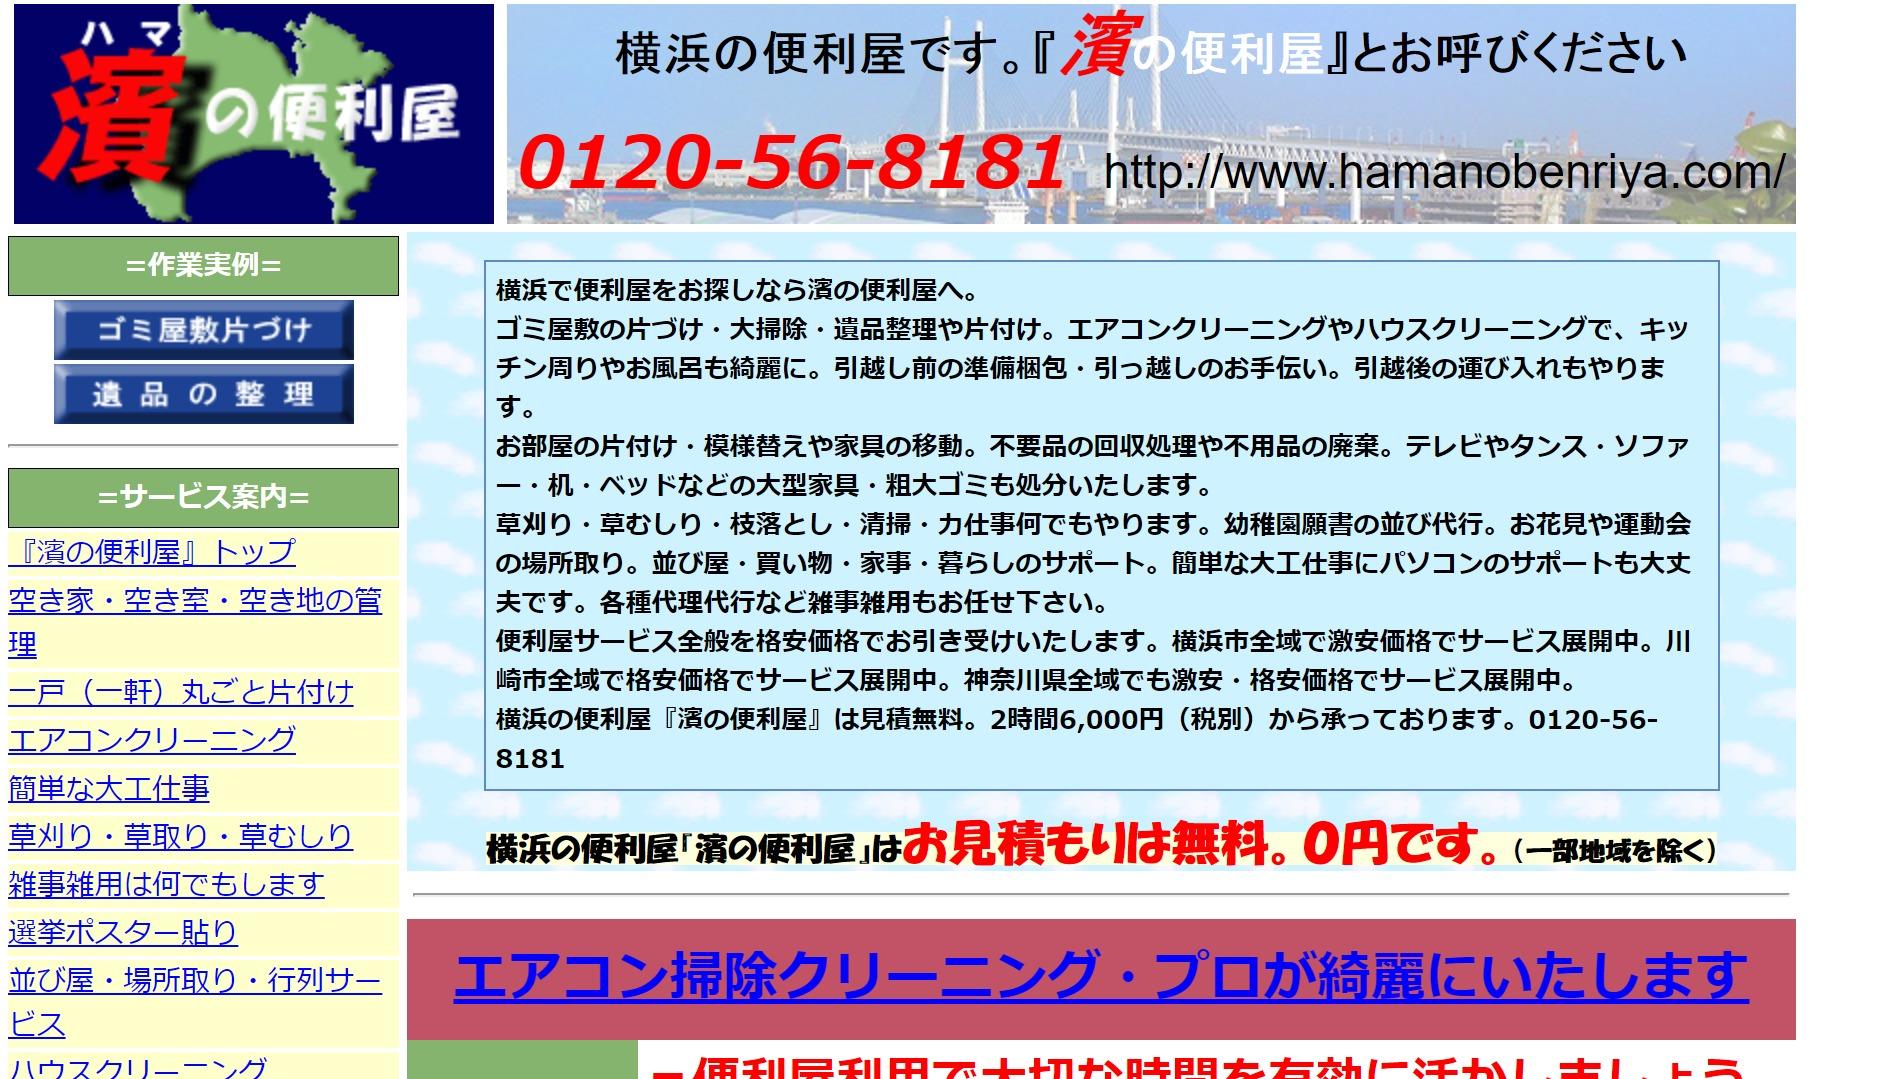 濱の便利屋(神奈川県横浜市神奈川区)